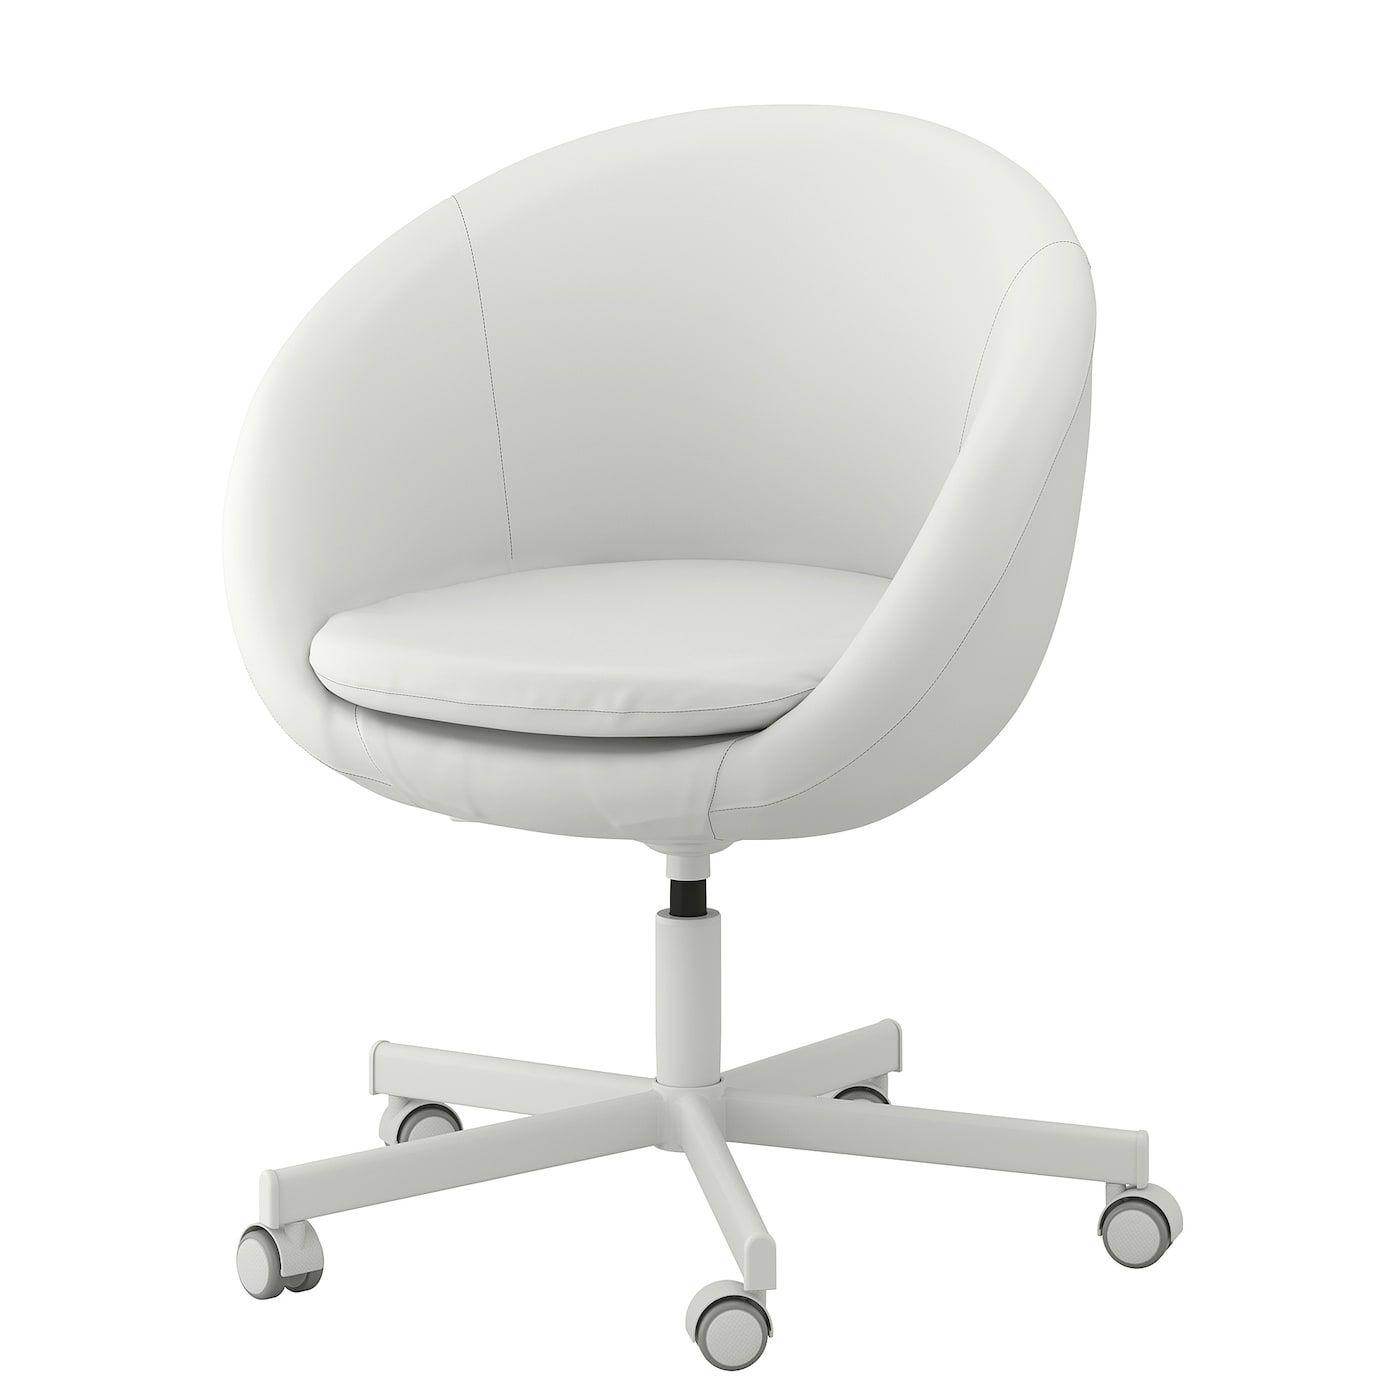 Skruvsta Chaise Pivotante Ysane Blanc Ikea Fauteuil Pivotant Chaises Pivotantes Chaise Ikea